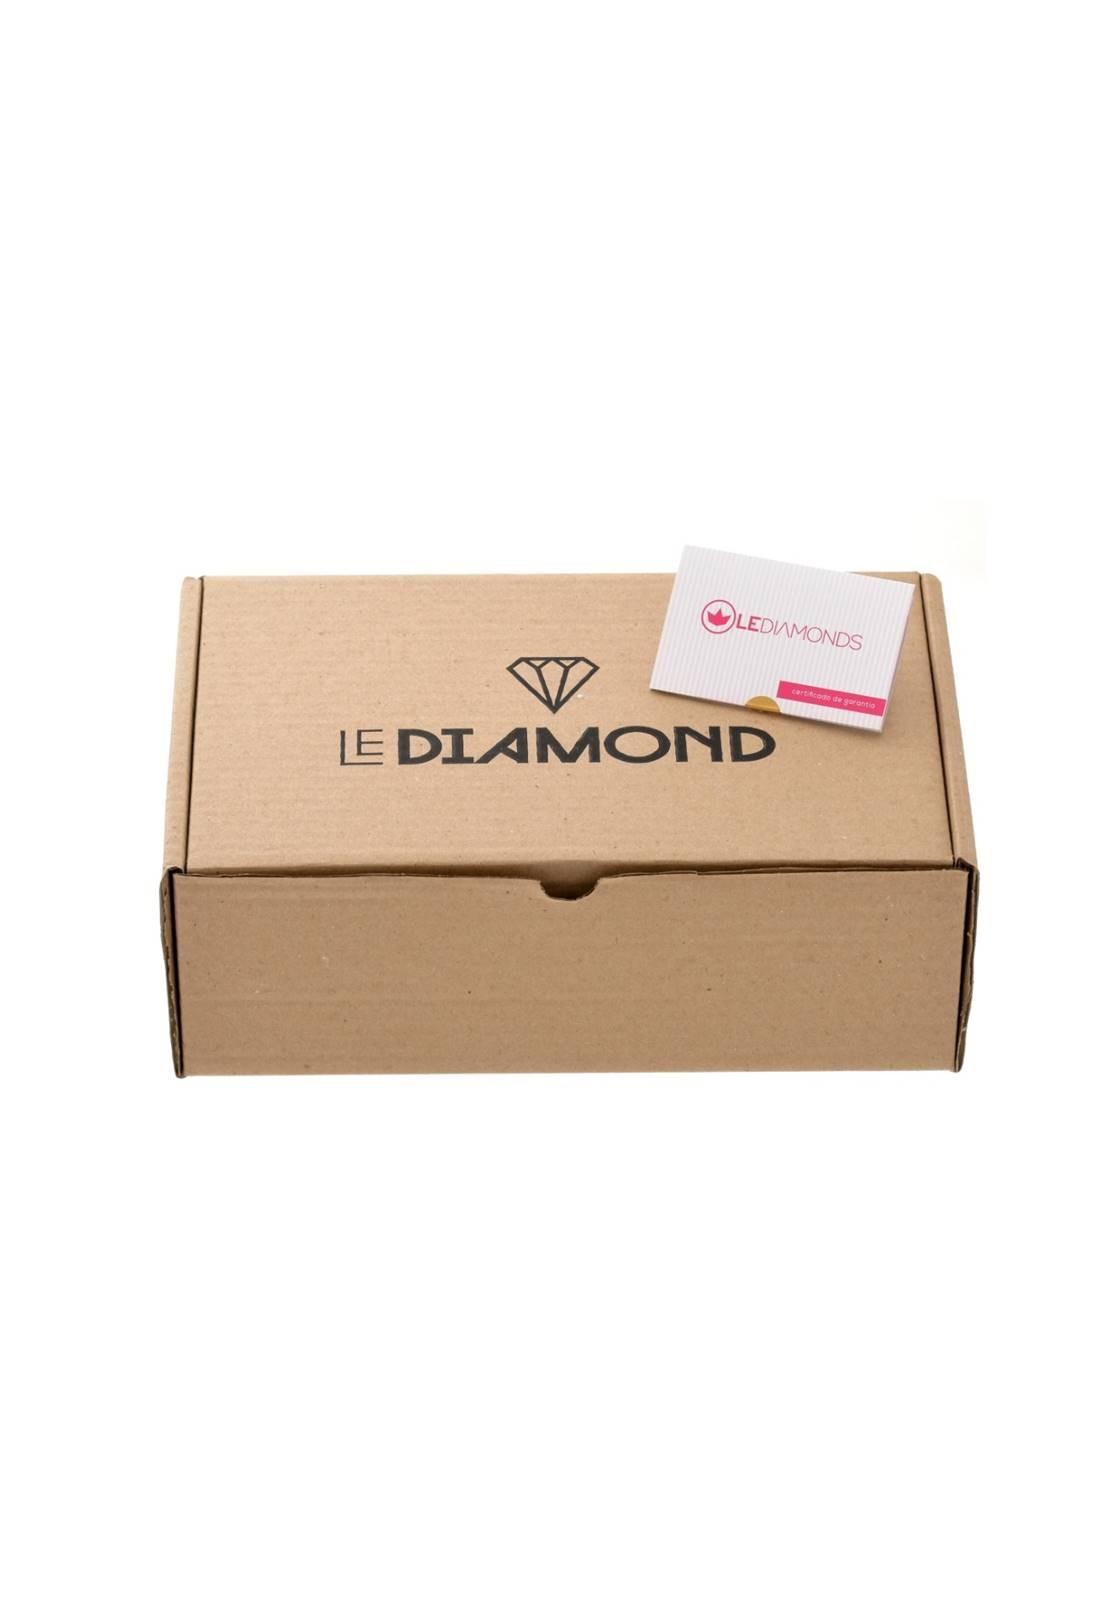 Anel Le Diamond Zircônias e Acrílico Lapidado Preto